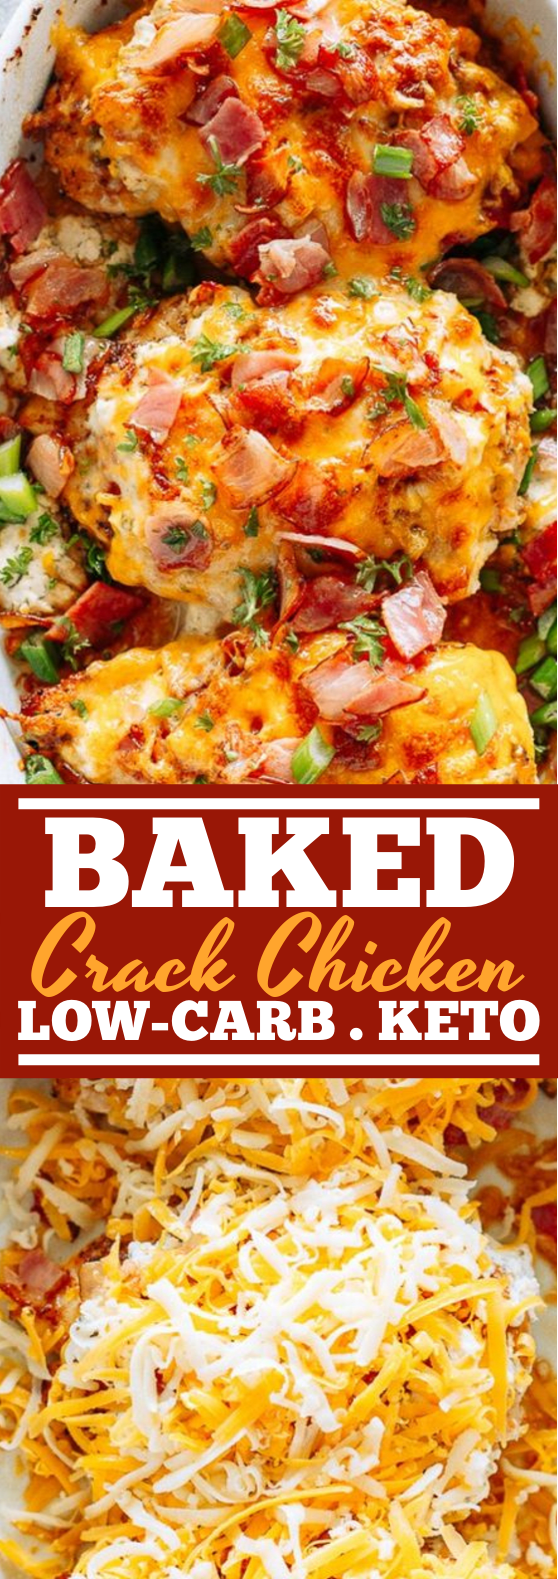 Baked Crack Chicken Breasts #keto #chicken #insurancequotes